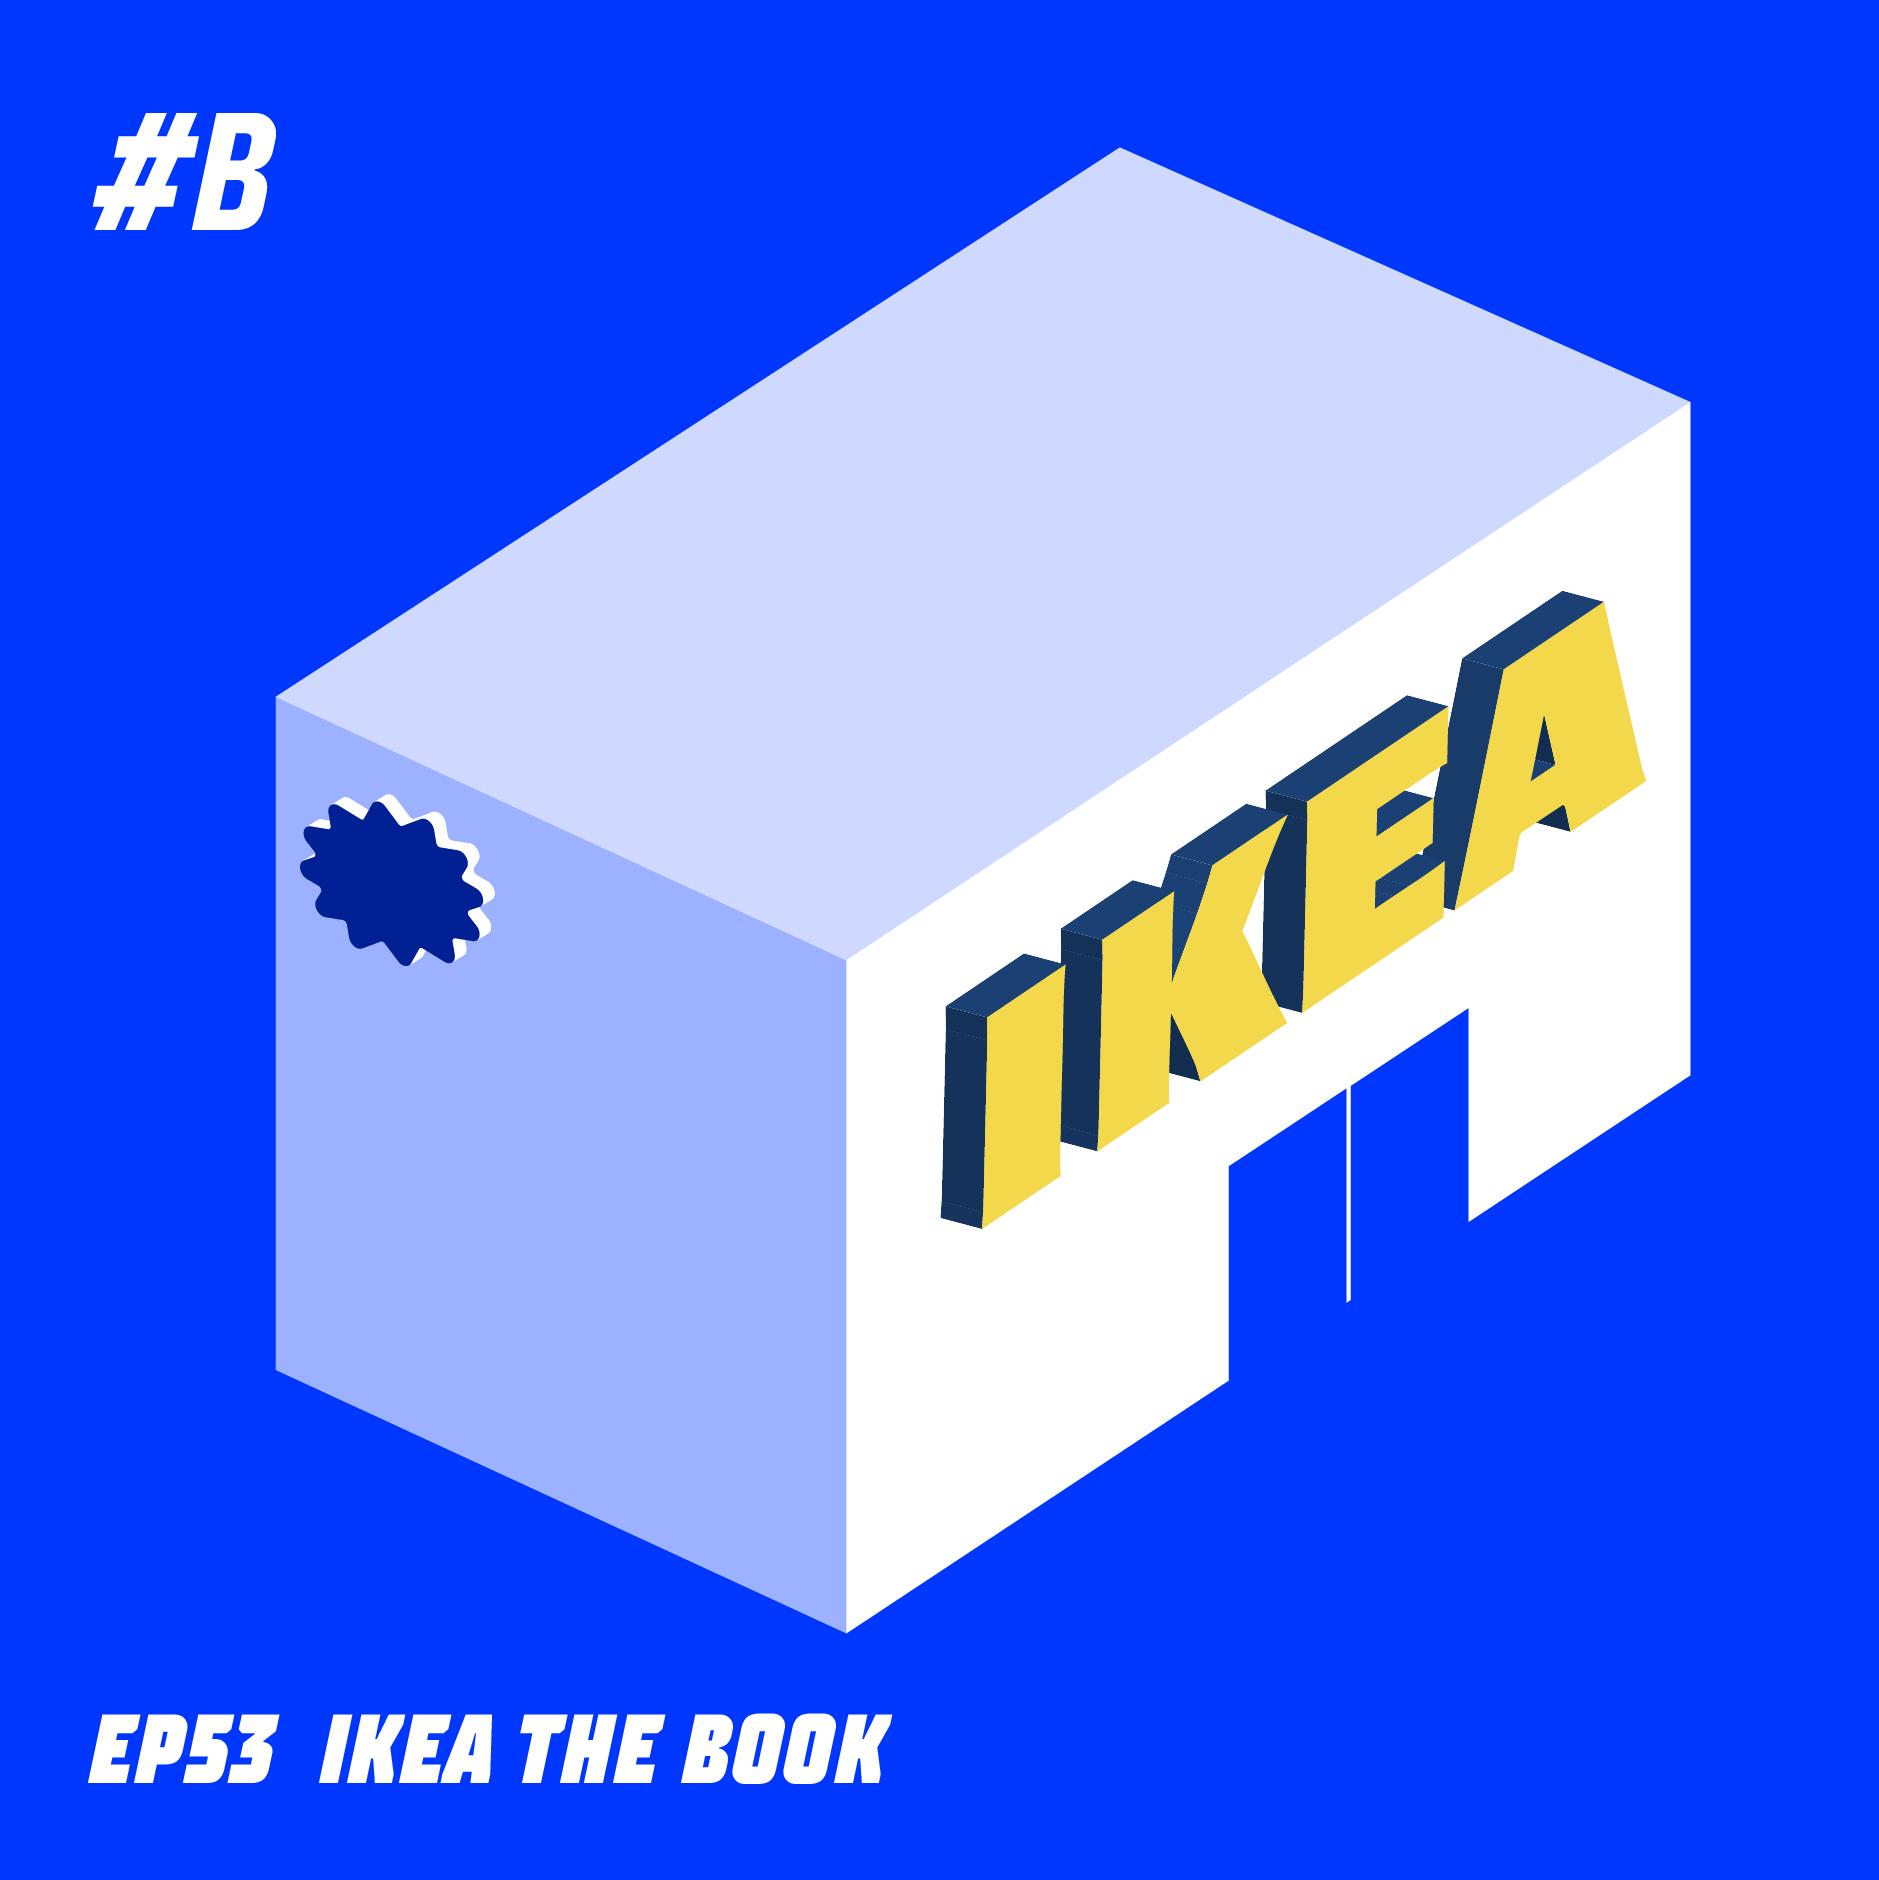 S3 EP.53 IKEA the book:確保人類生存 -  掰掰宜家敦北店 x 台北消逝的物件 x 發現了超好喝的焦糖奶茶  #B